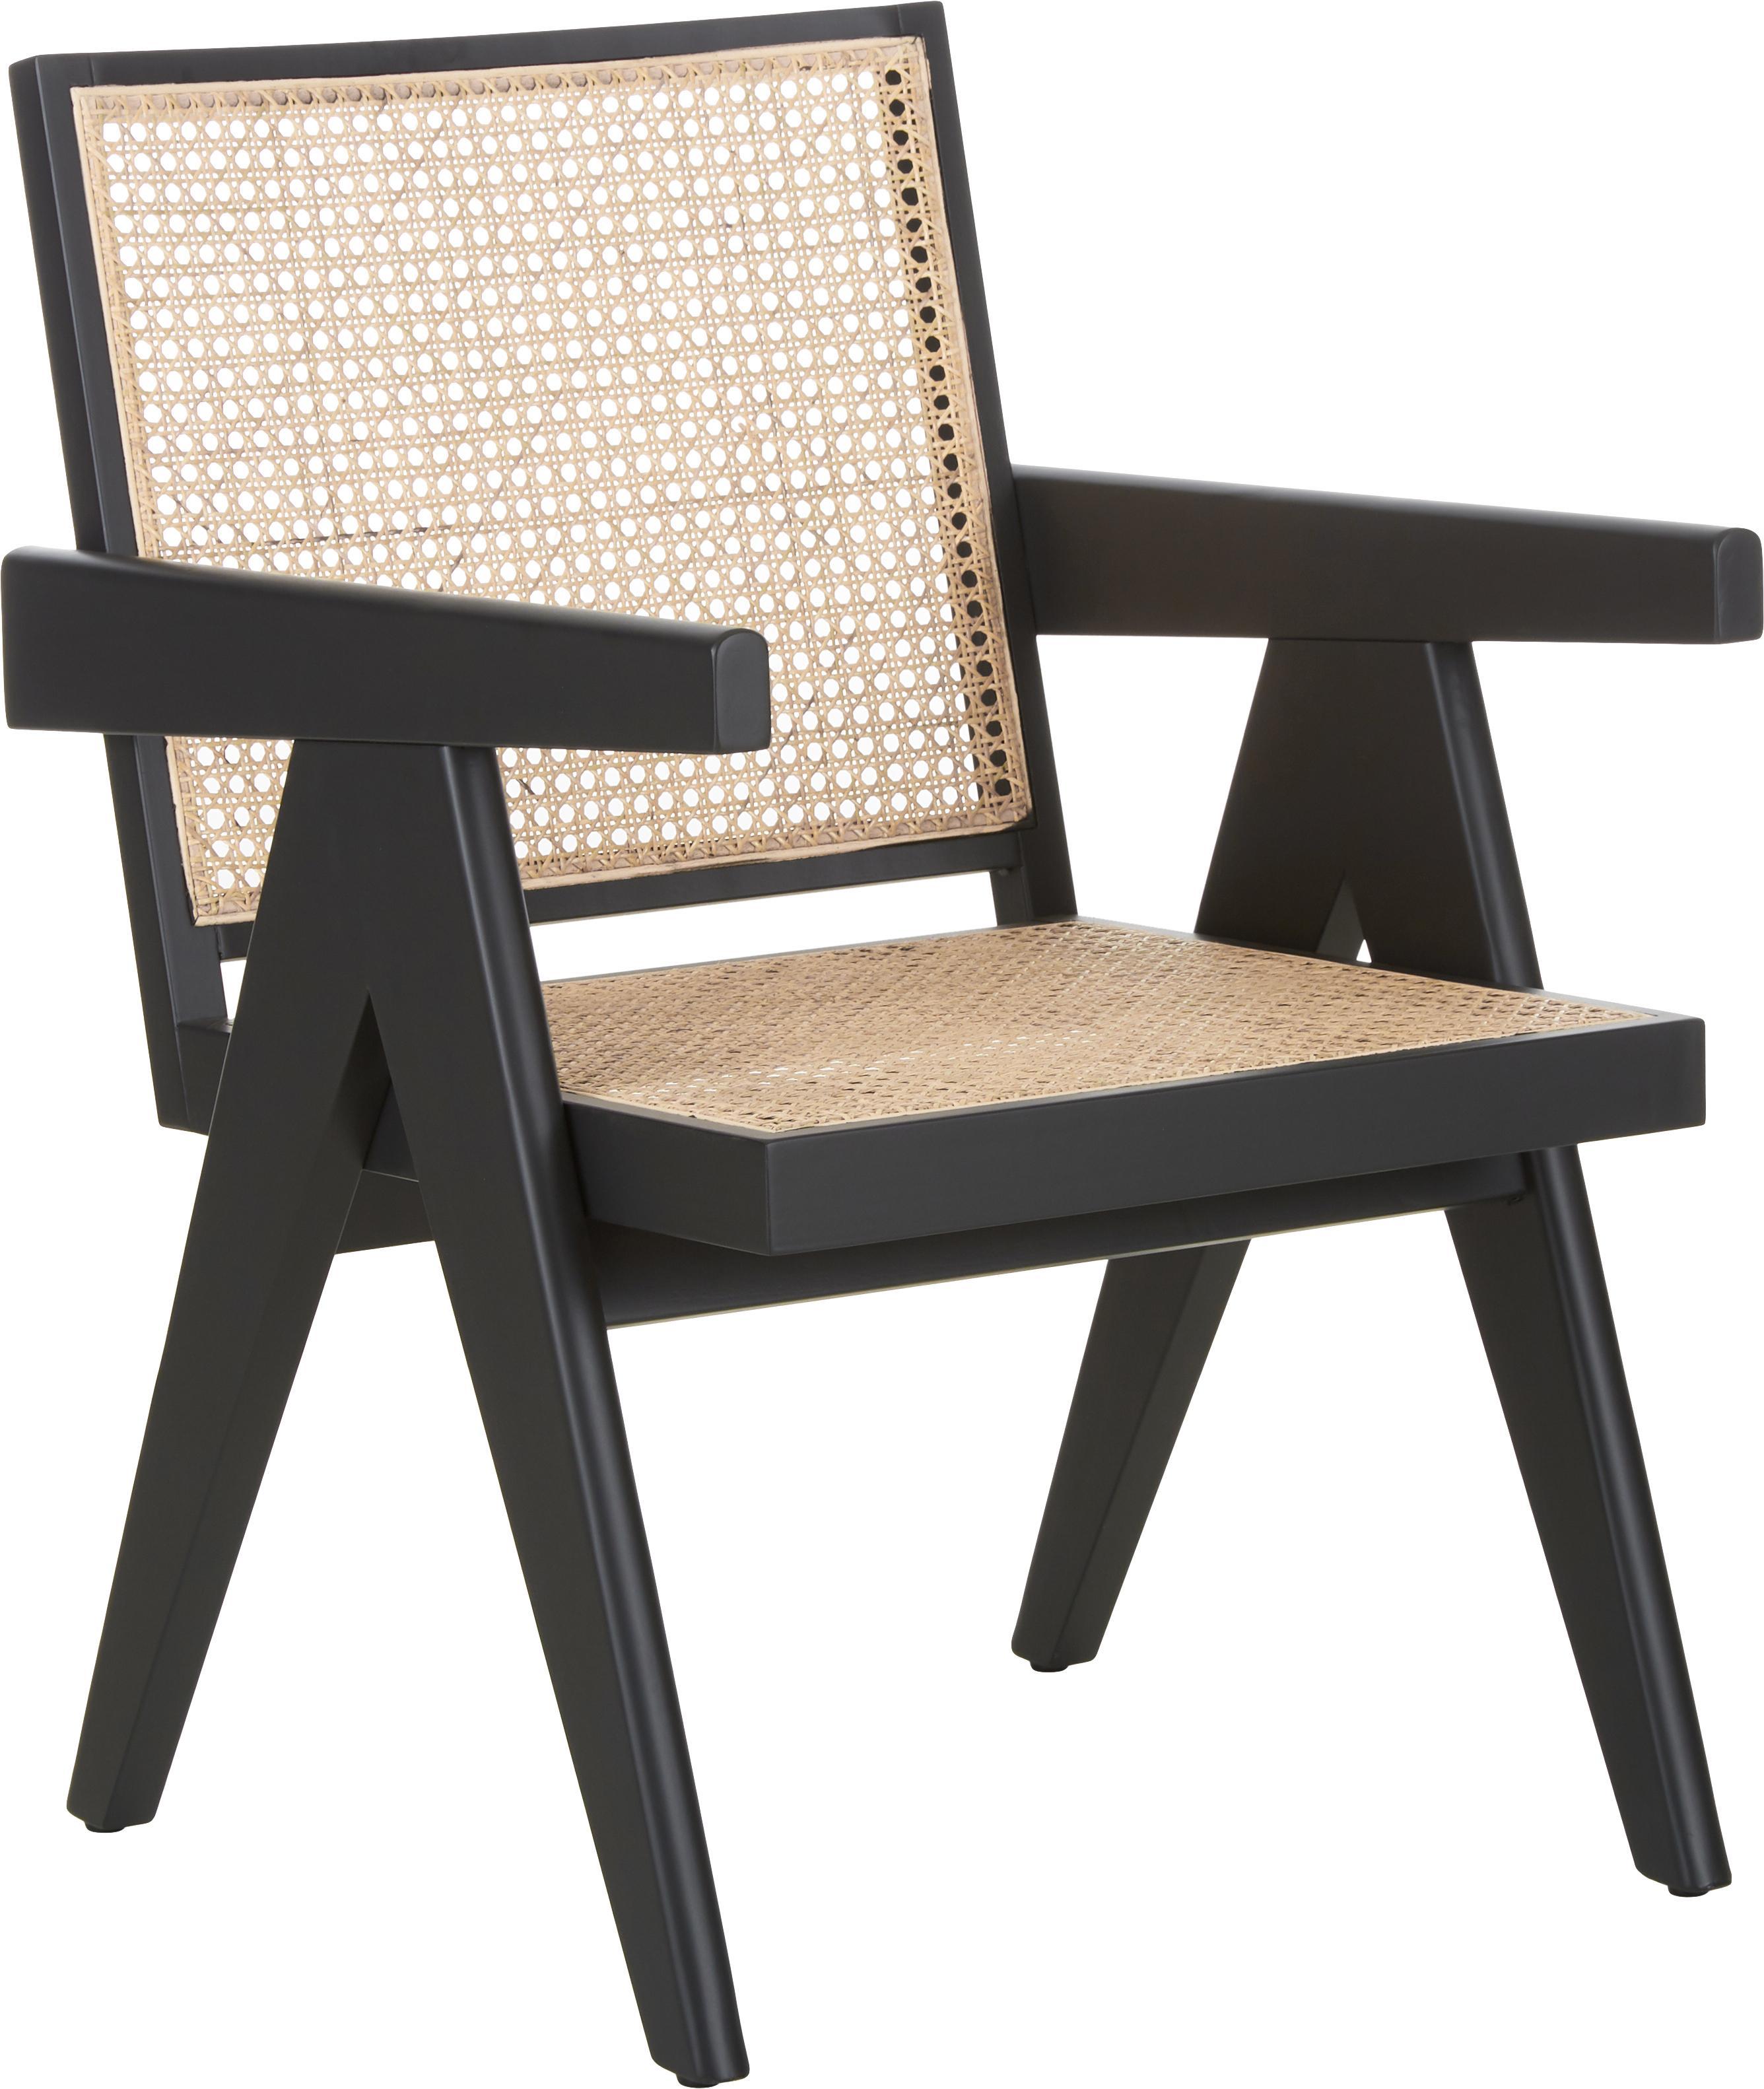 Sillón Sissi, Estructura: madera de haya pintada, Asiento: ratán, Negro, beige, An 58 x F 66 cm